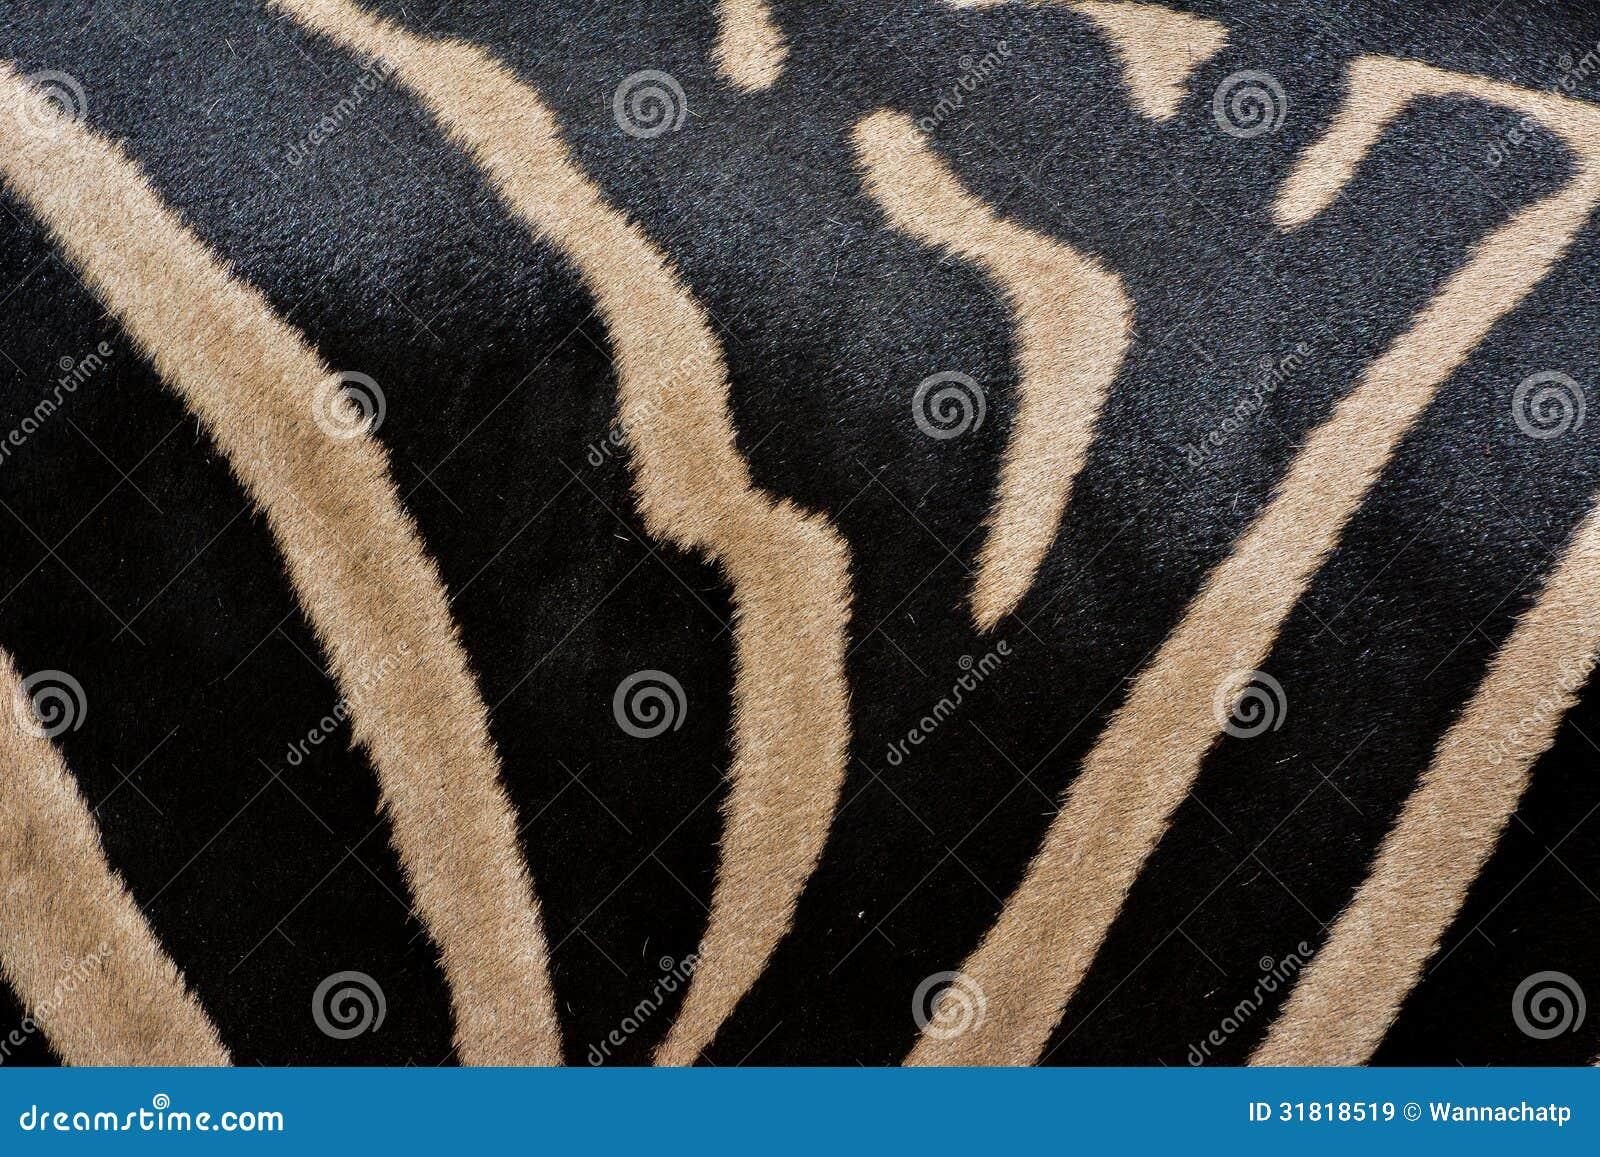 Real zebra pattern - photo#13